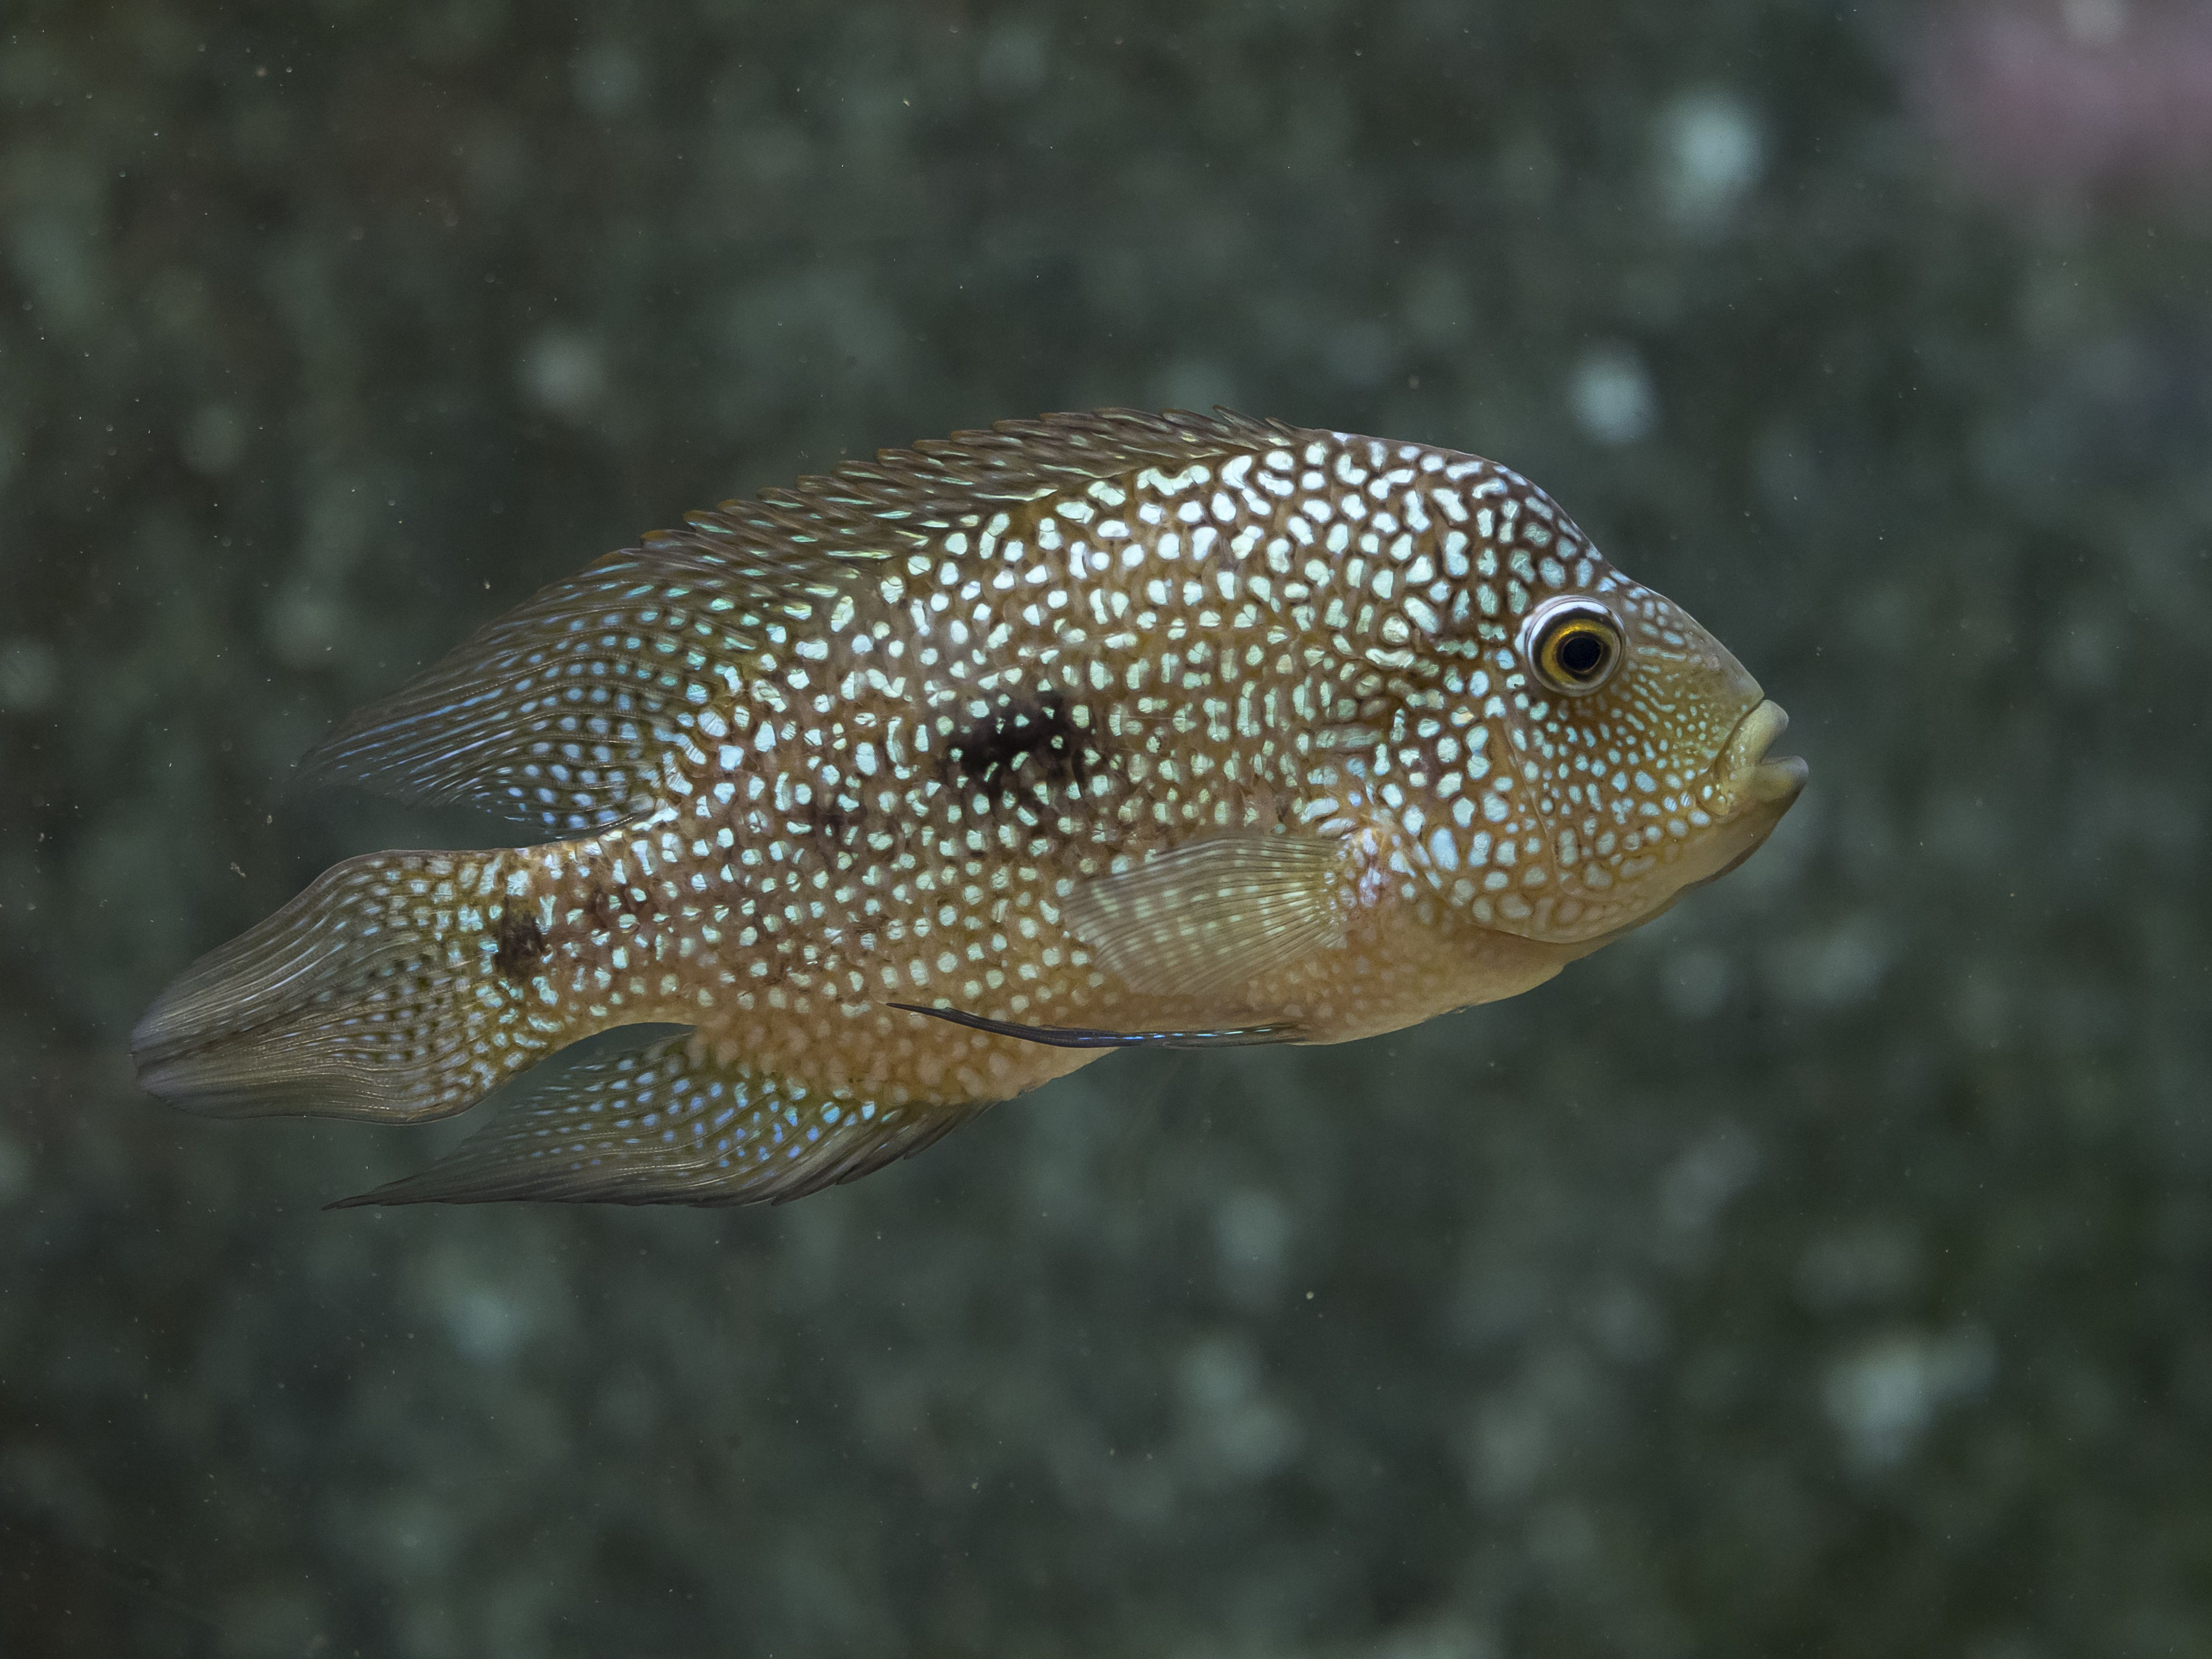 The fish texas cichlid (Cichlasoma cyanoguttatum). Originally from North America.